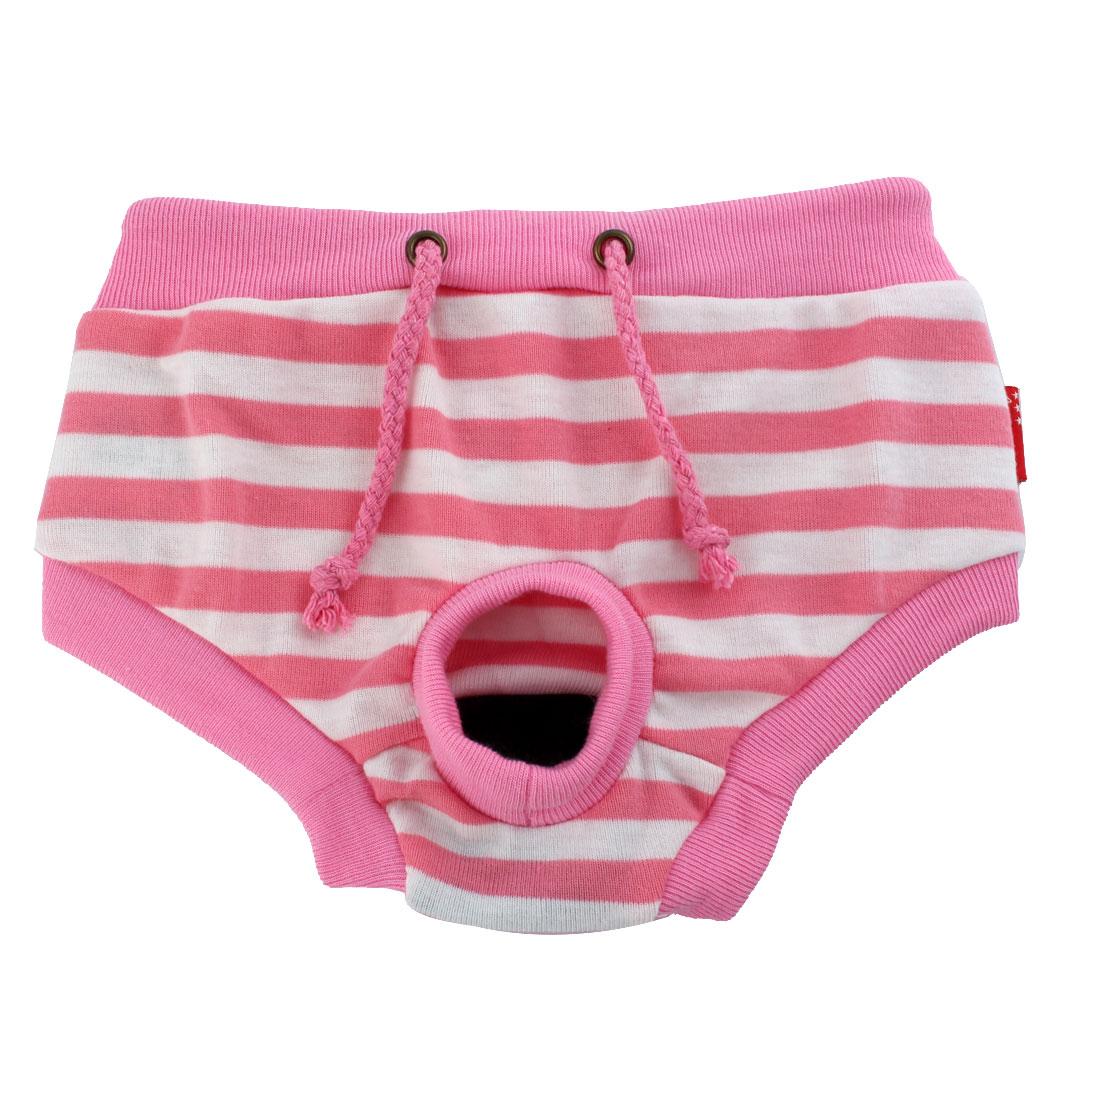 Pet Dog Apparel Pink Physiological Sanitary Menstrual Diaper Pants Size L